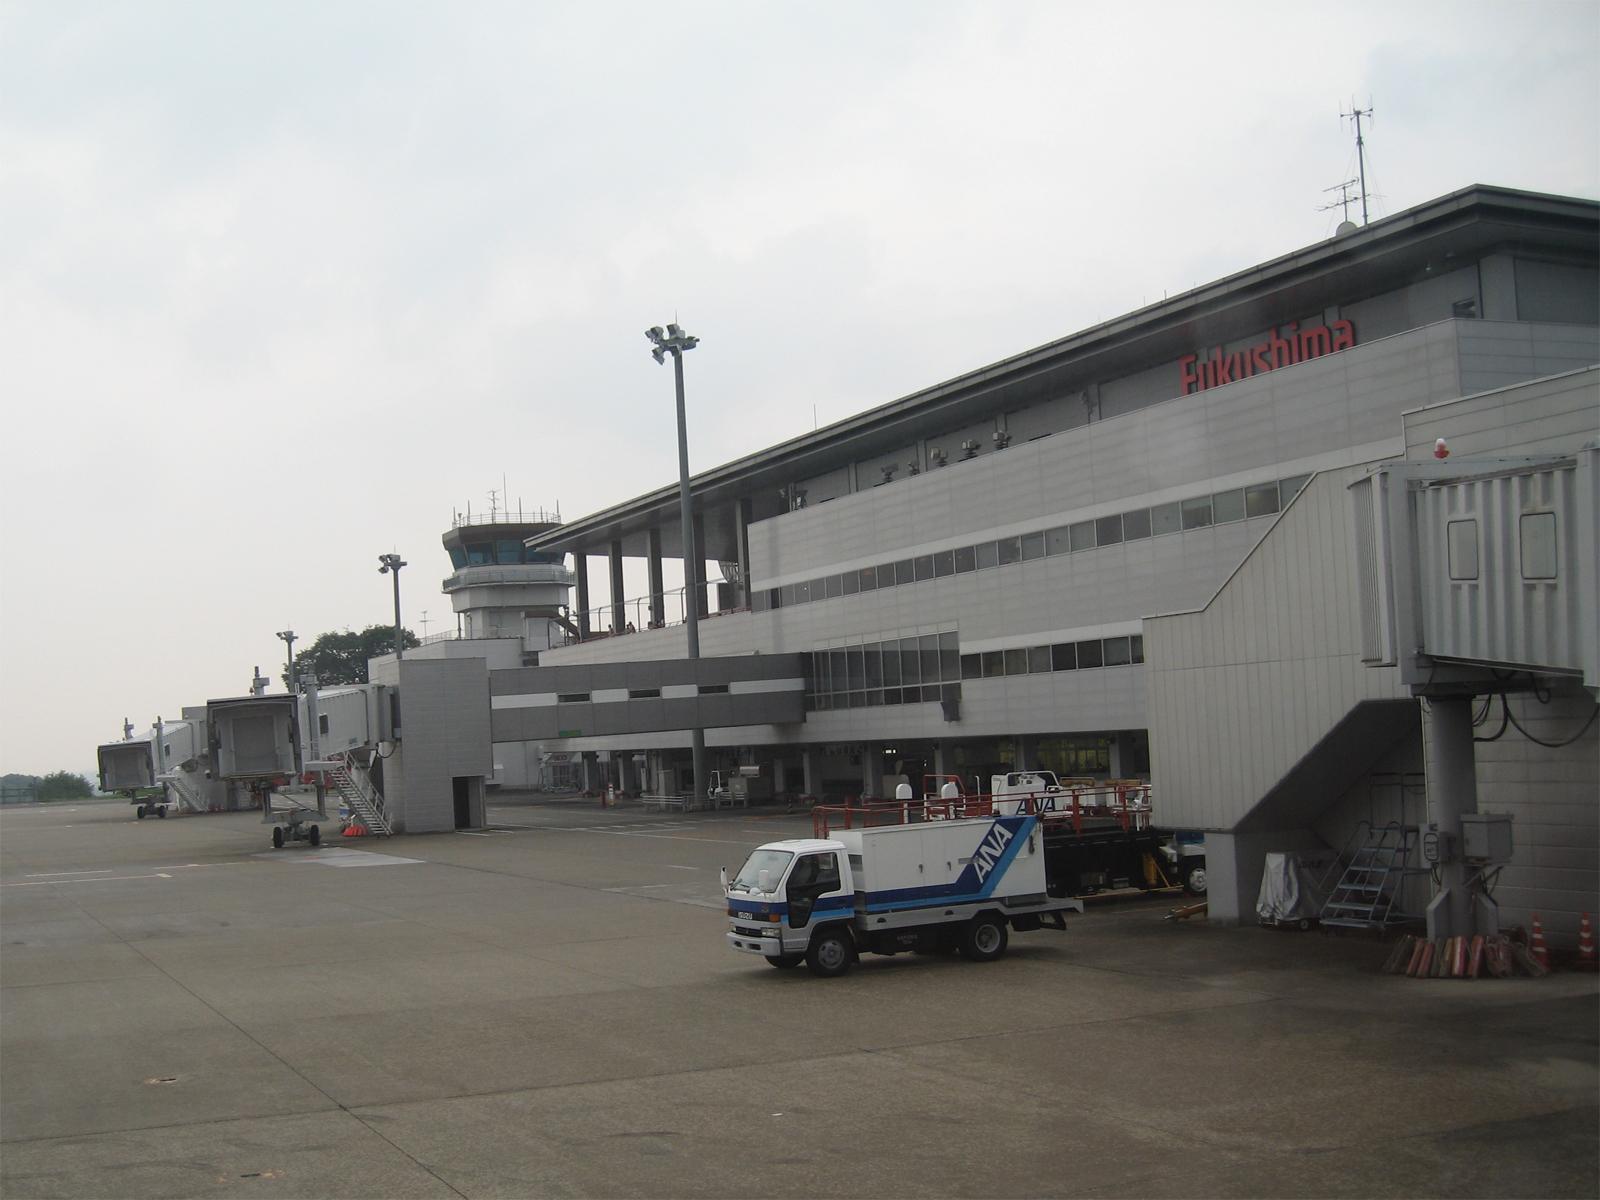 Lapangan Terbang Fukushima